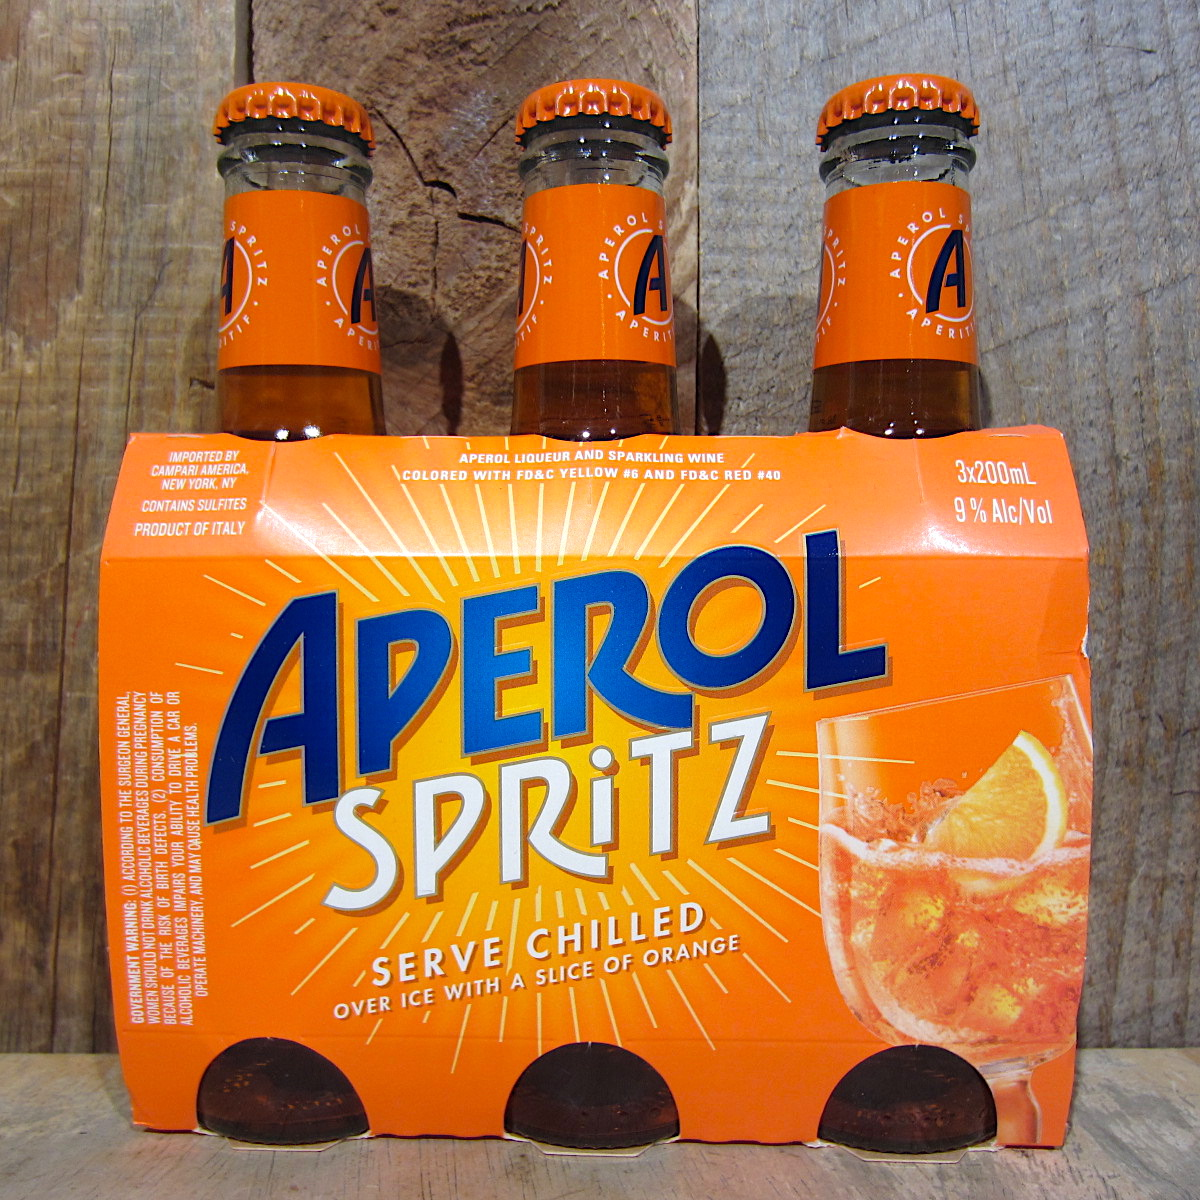 Aperol Spritz (3-Pack)